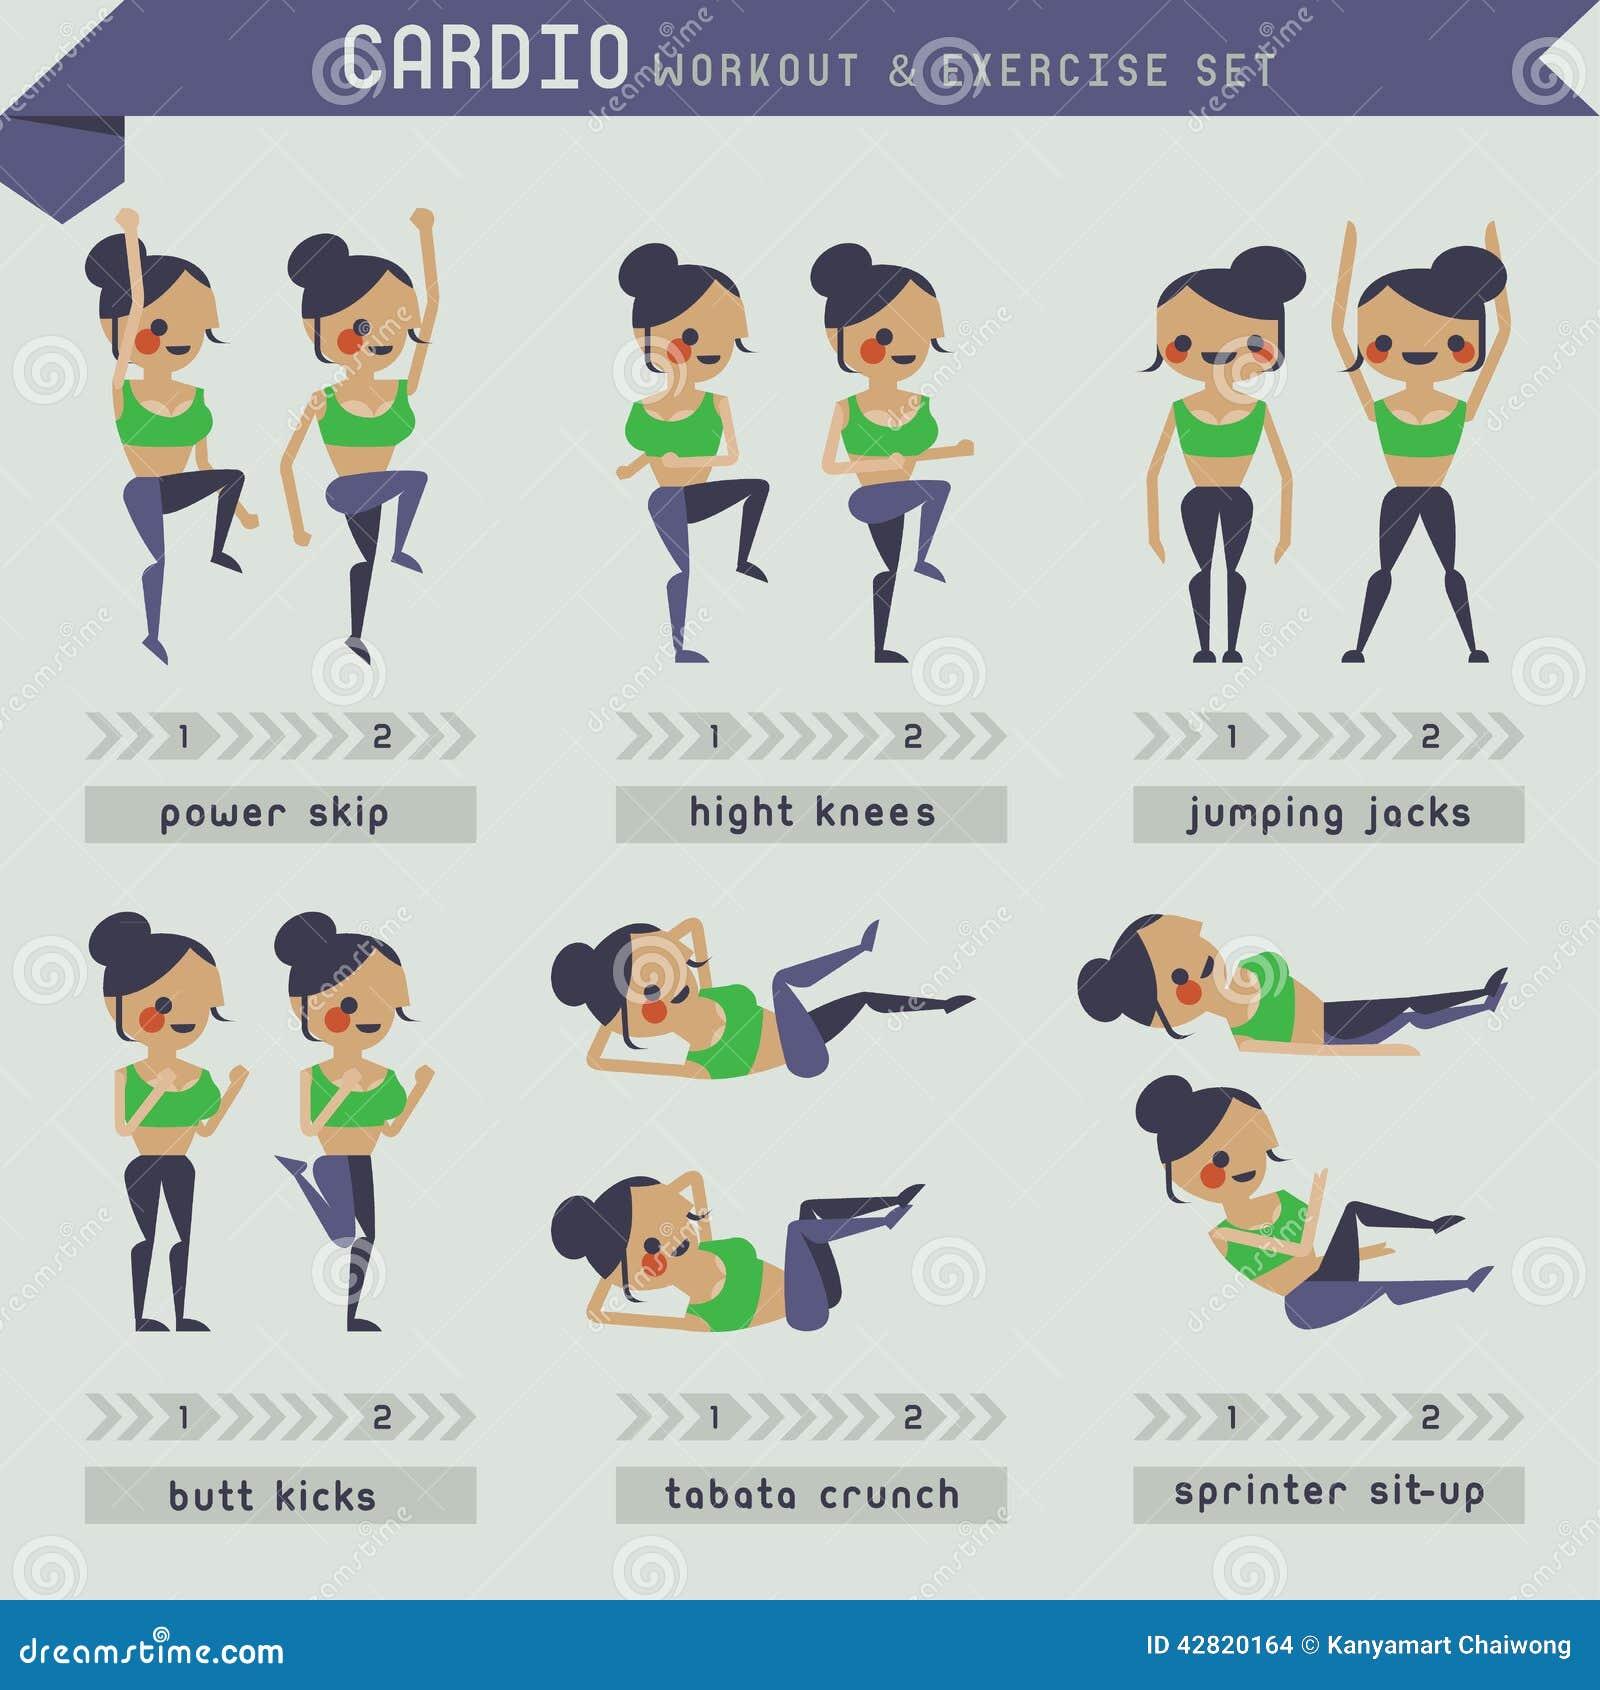 exercice gym cardio